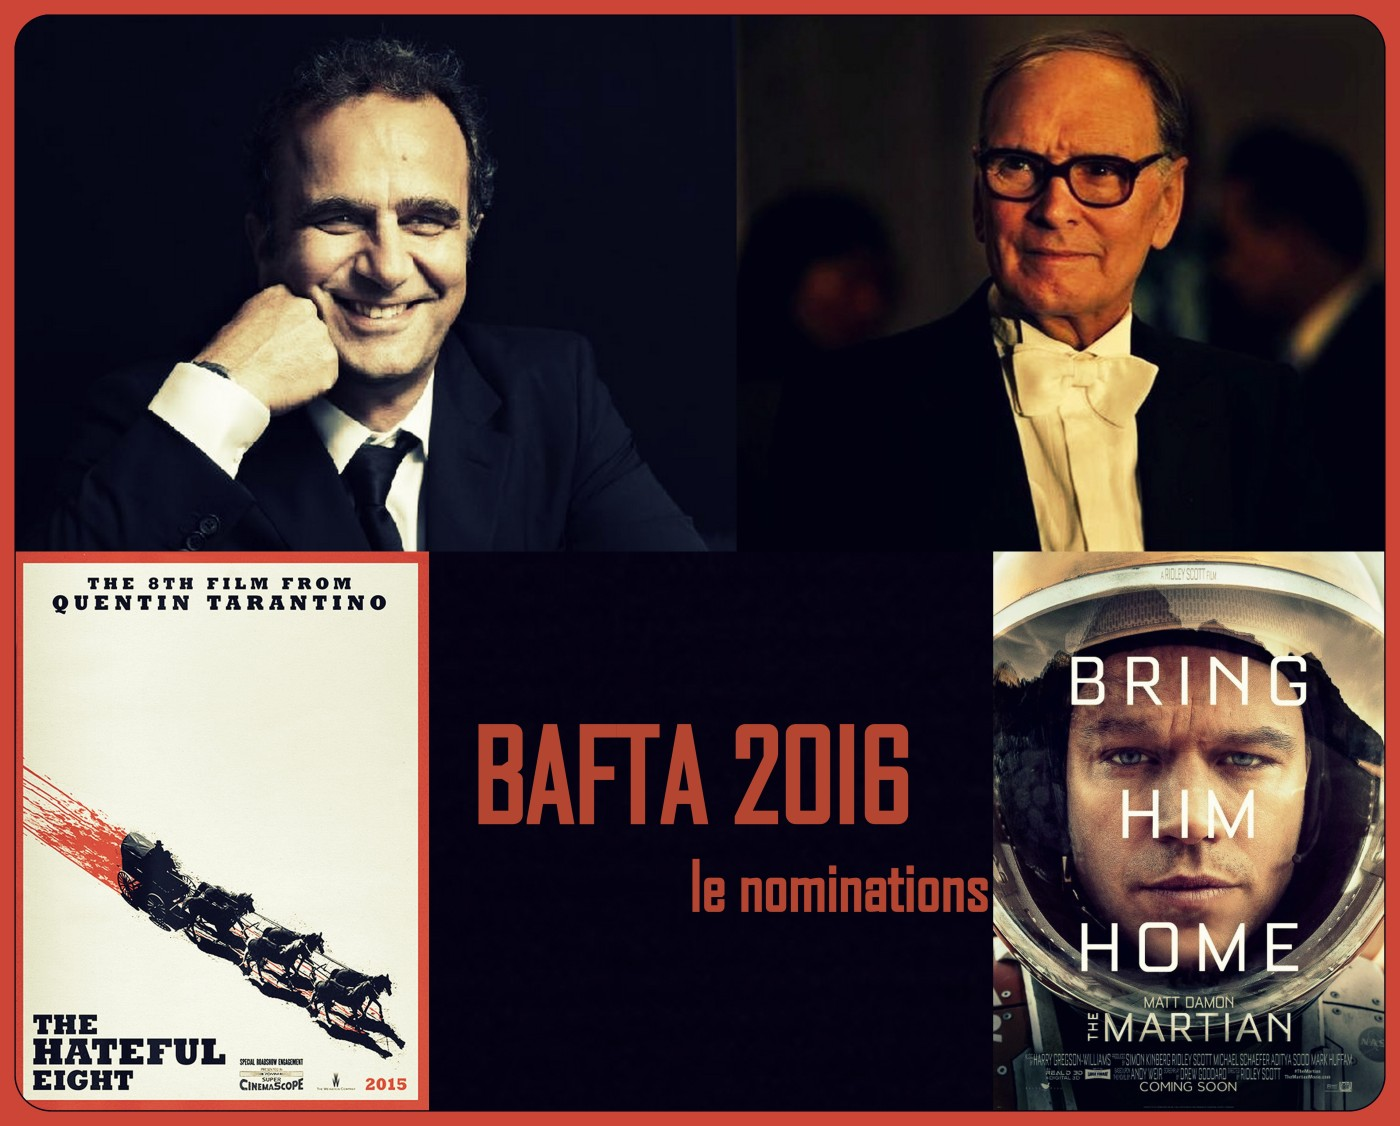 Bafta Awards: Bafta 20I6, Due Italiani Candidati Agli Oscar Inglesi